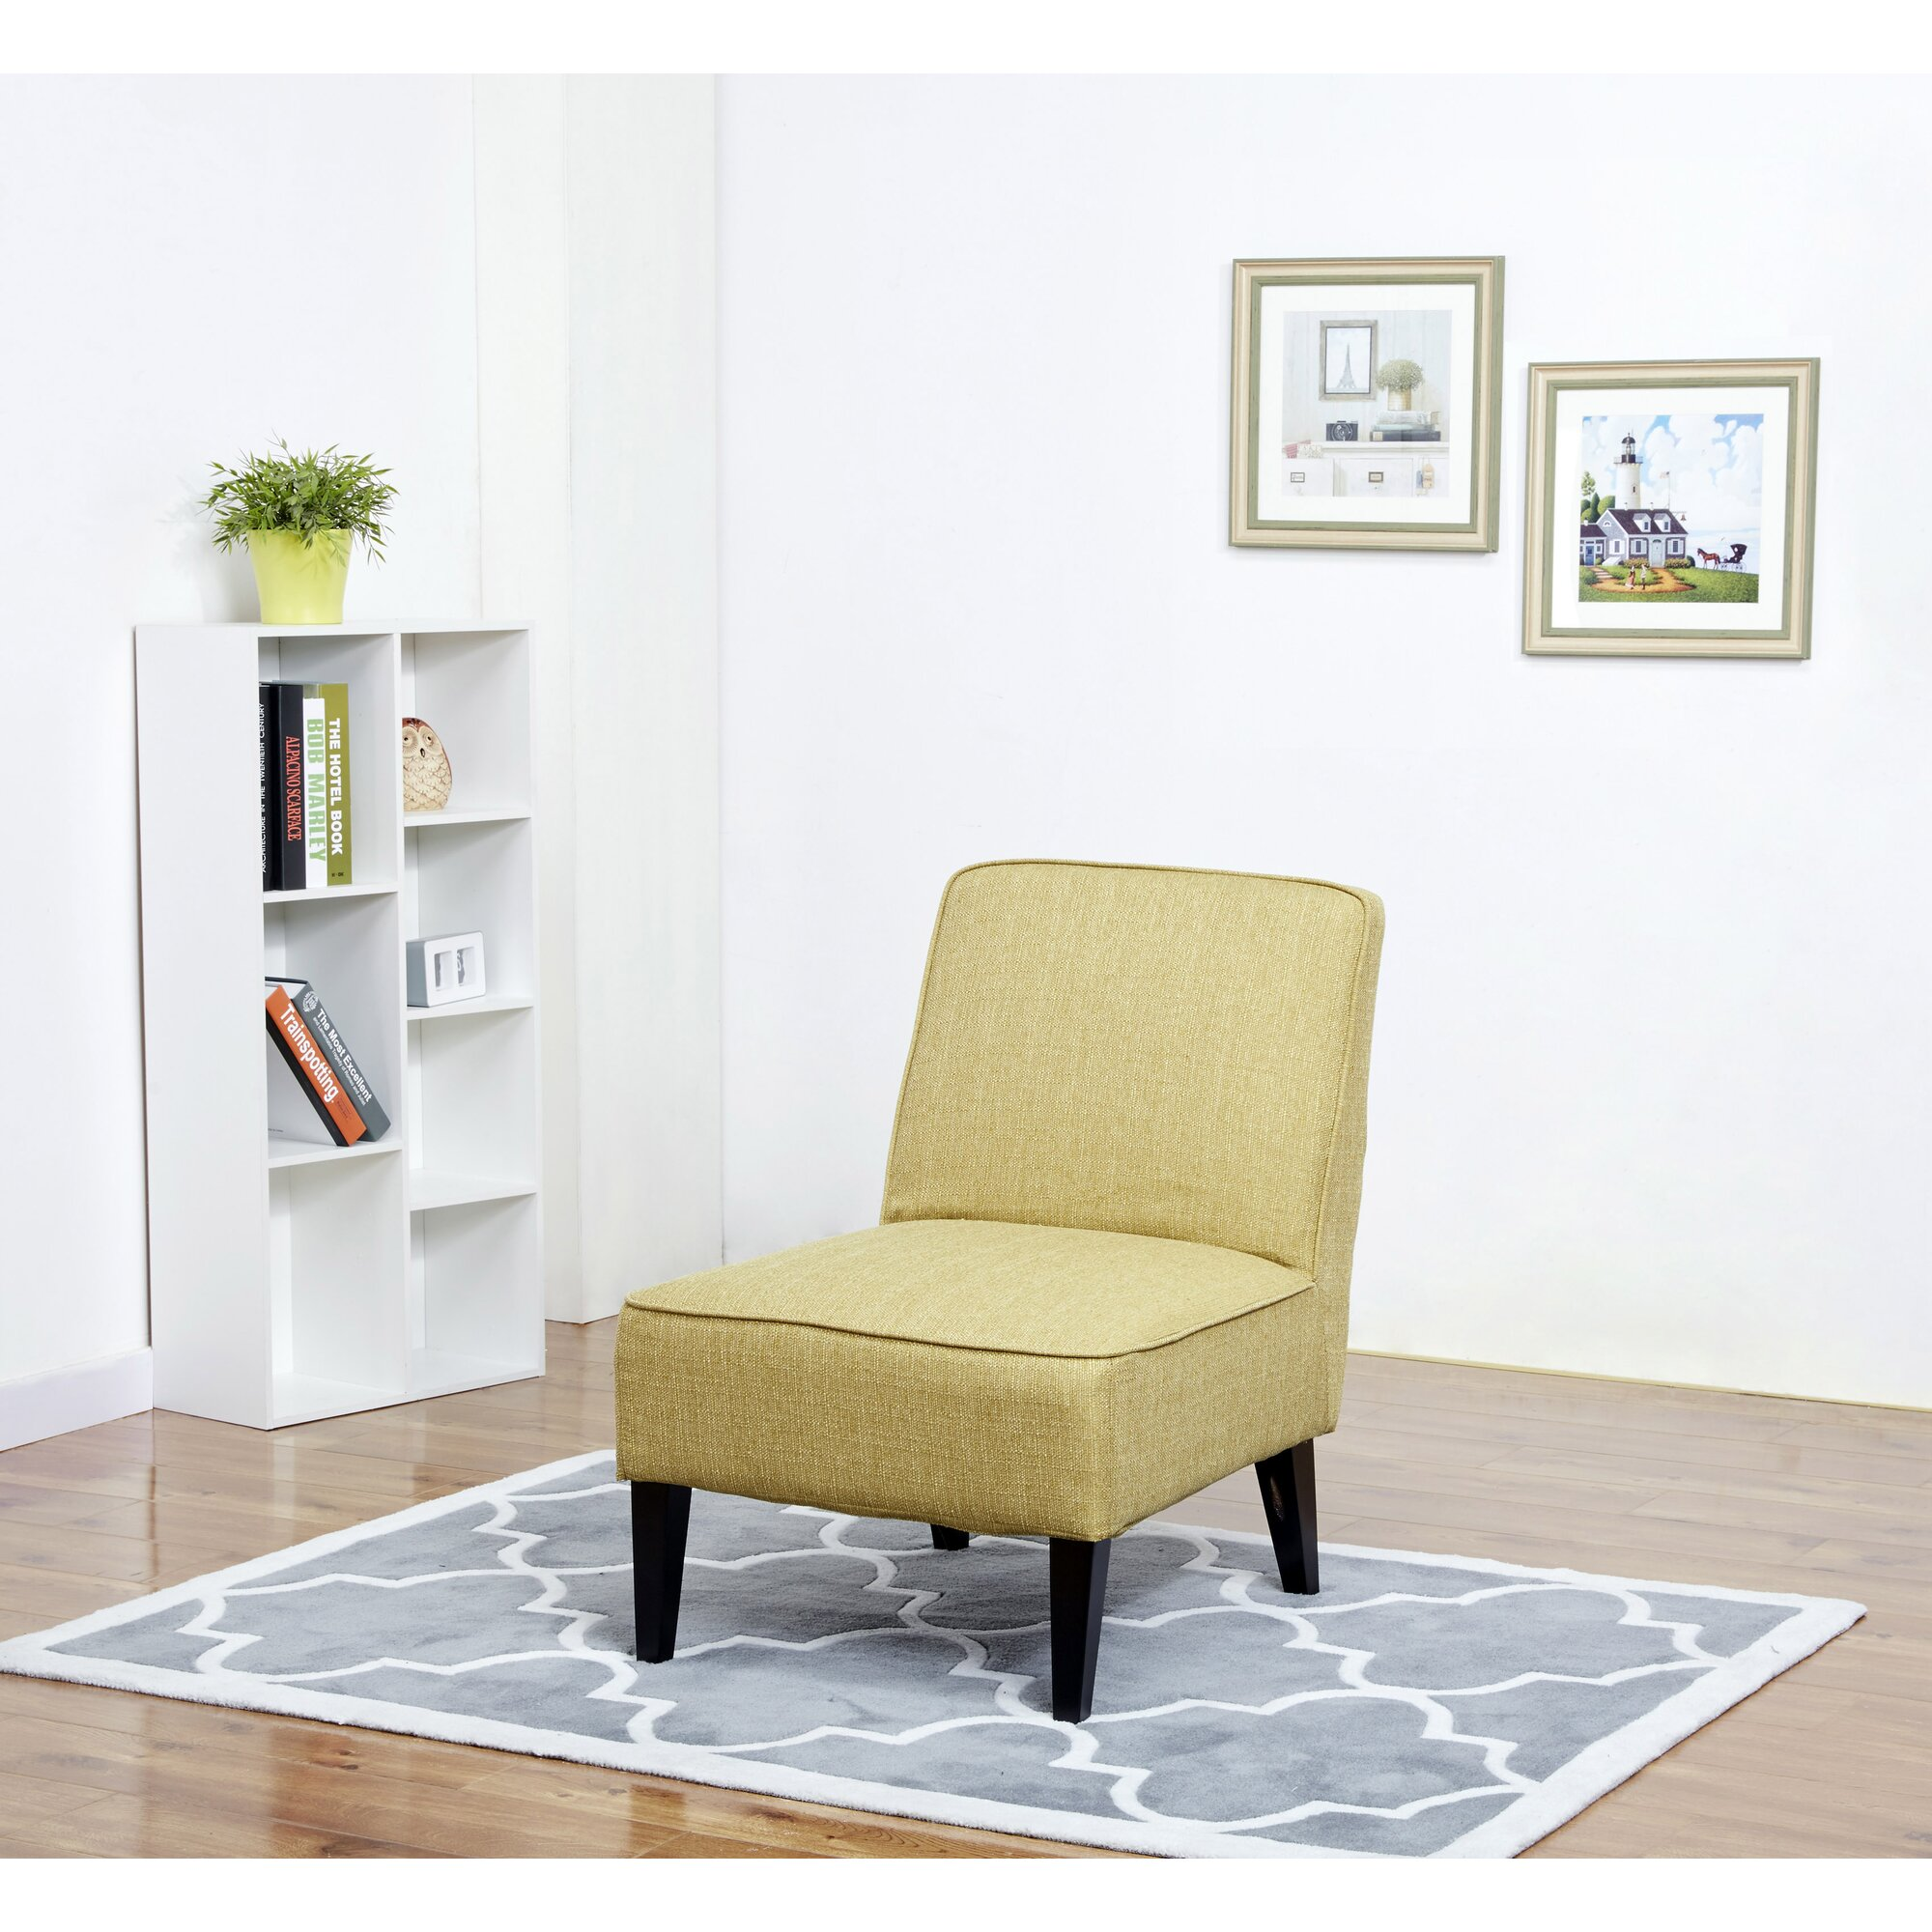 finley slipper chair - Slipper Chairs